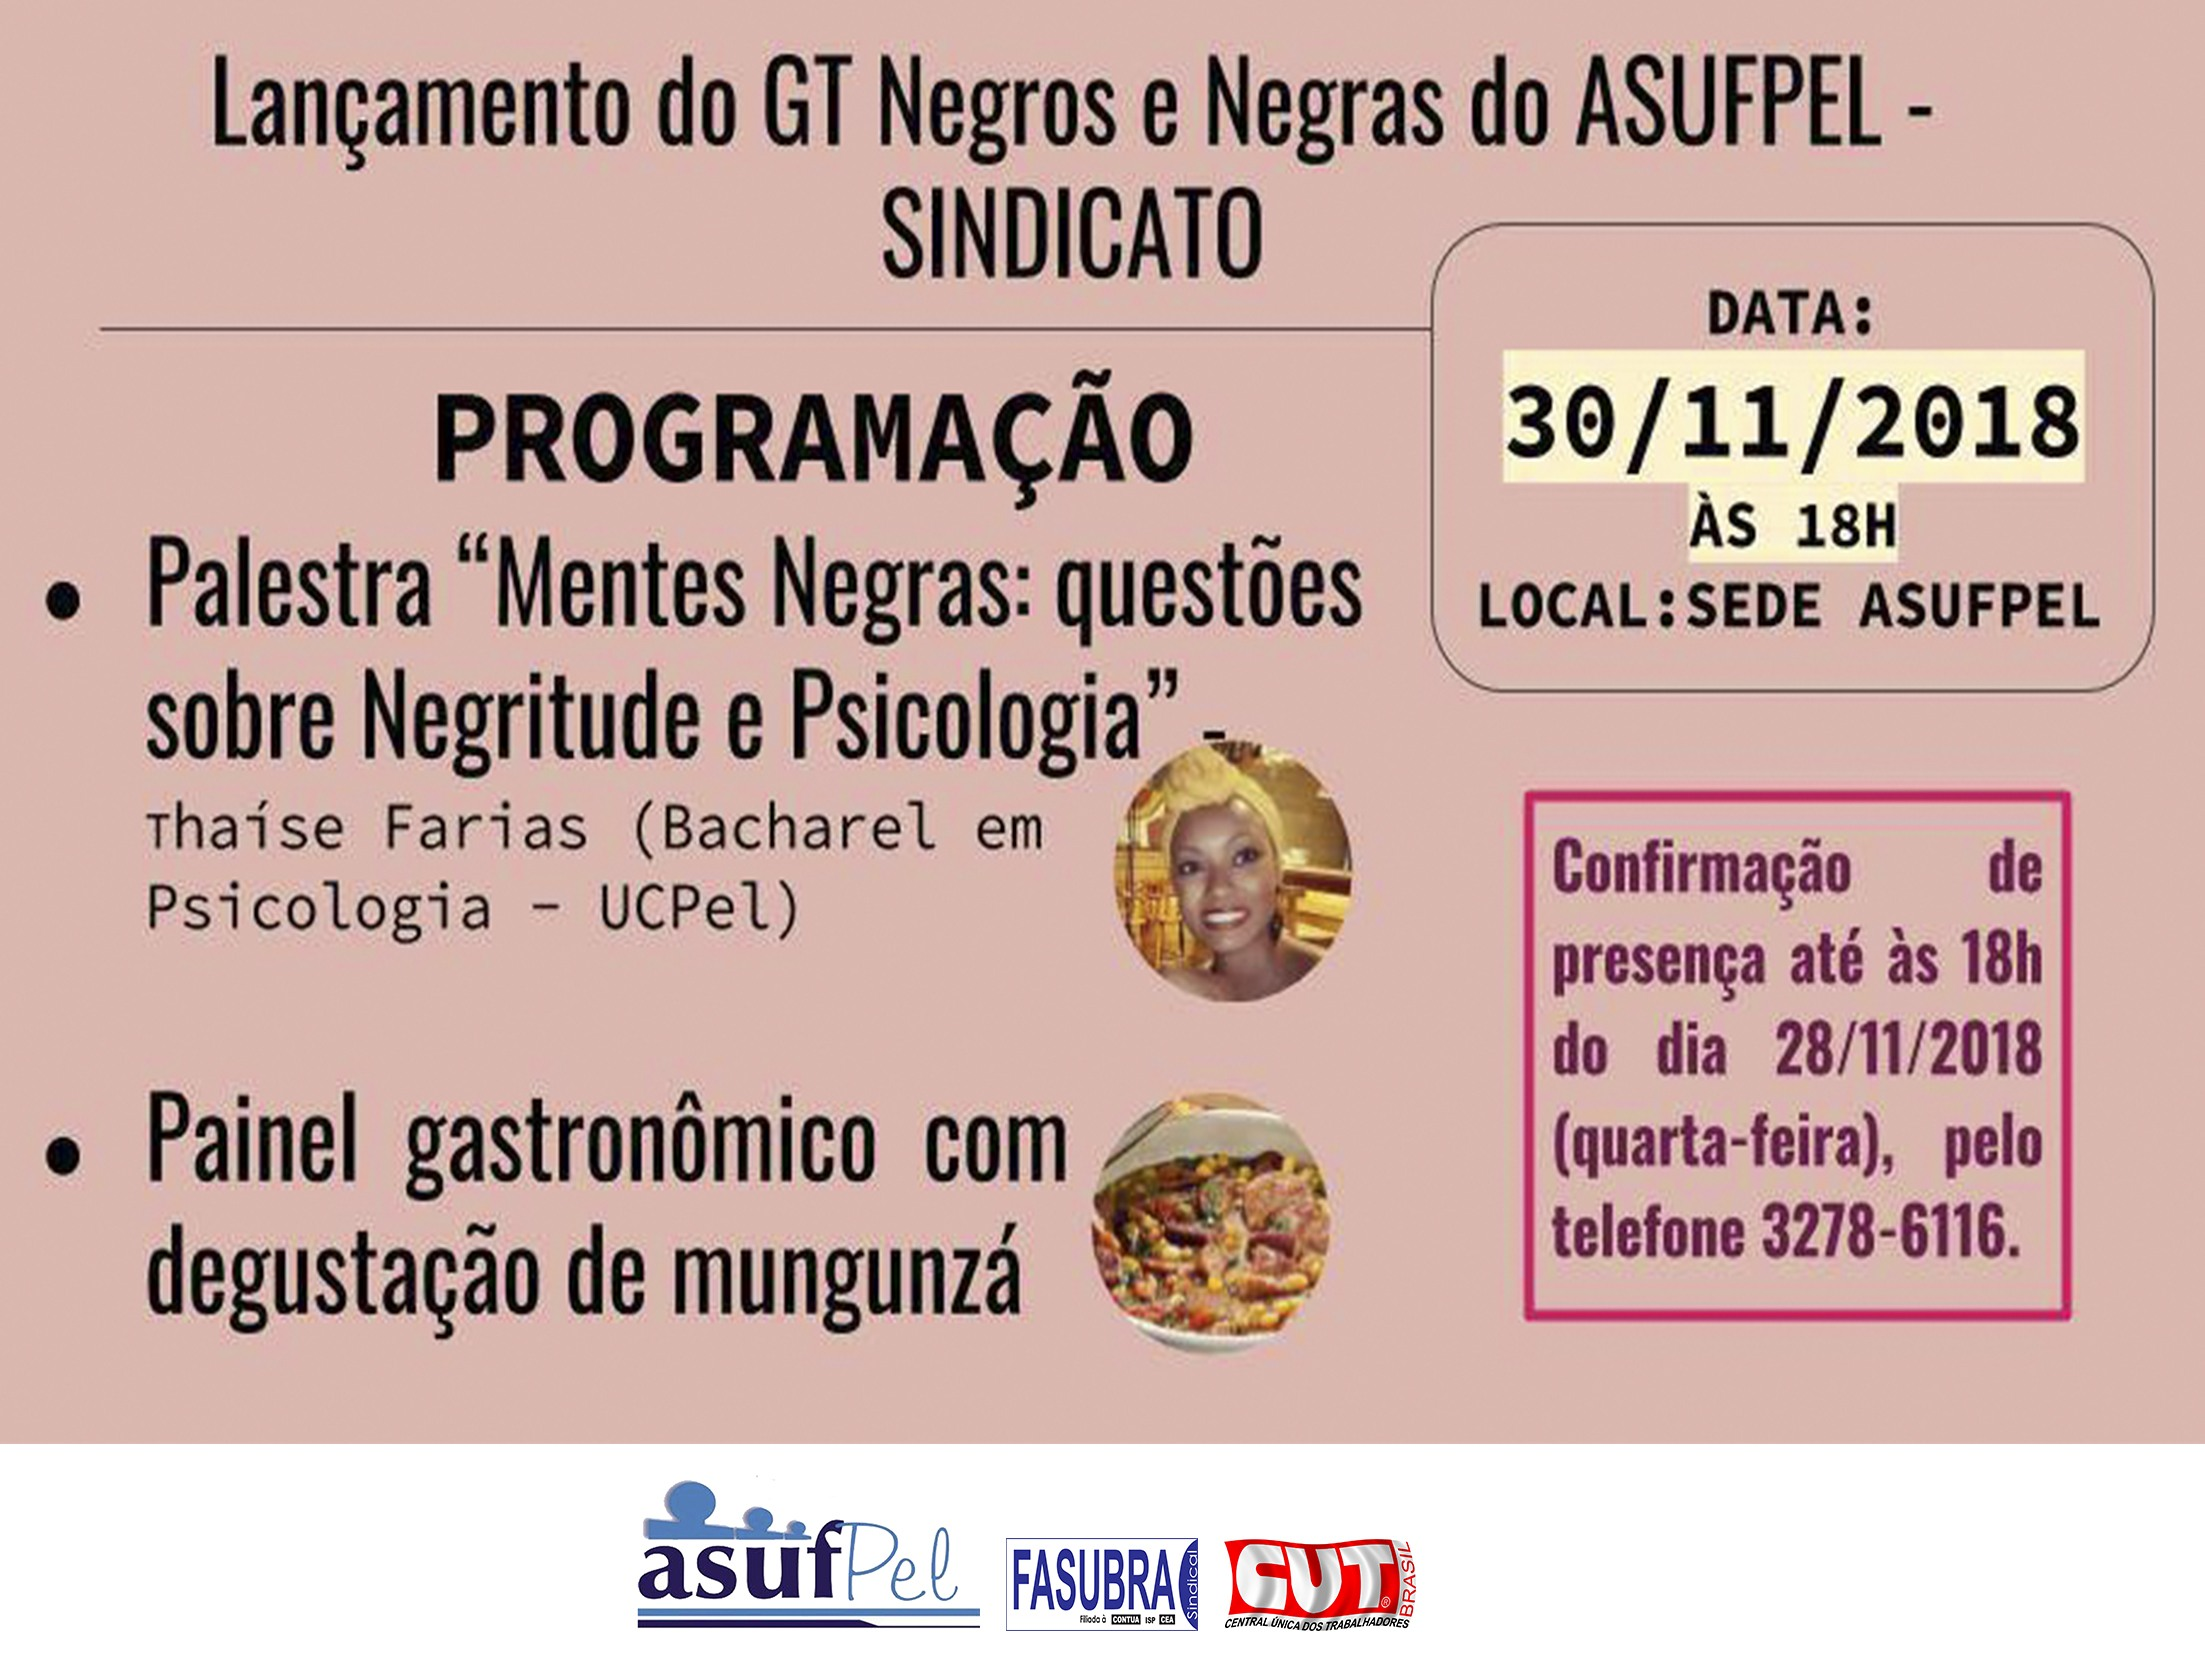 Lançamento do GT Negros e Negras do ASUFPEL-Sindicato